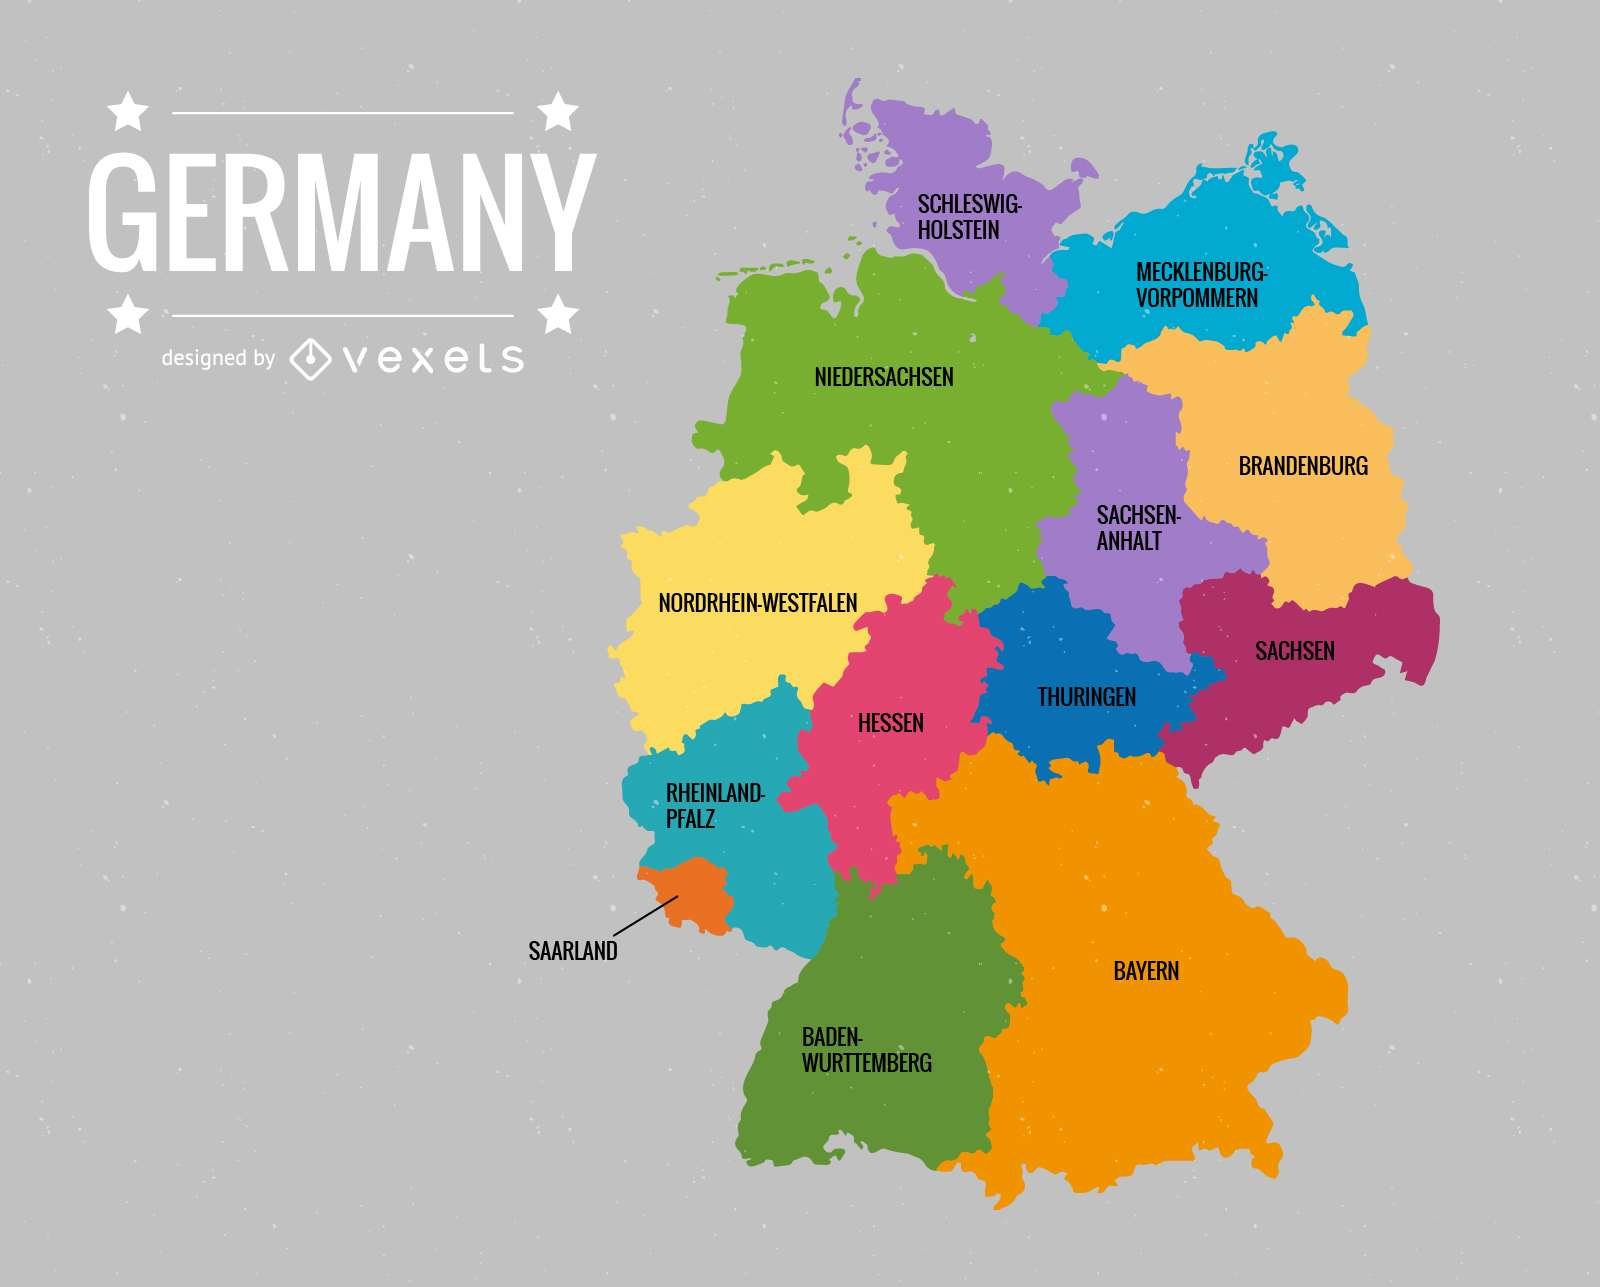 Gratis Deutschlandkarte Bestellen Alle Gratisproben